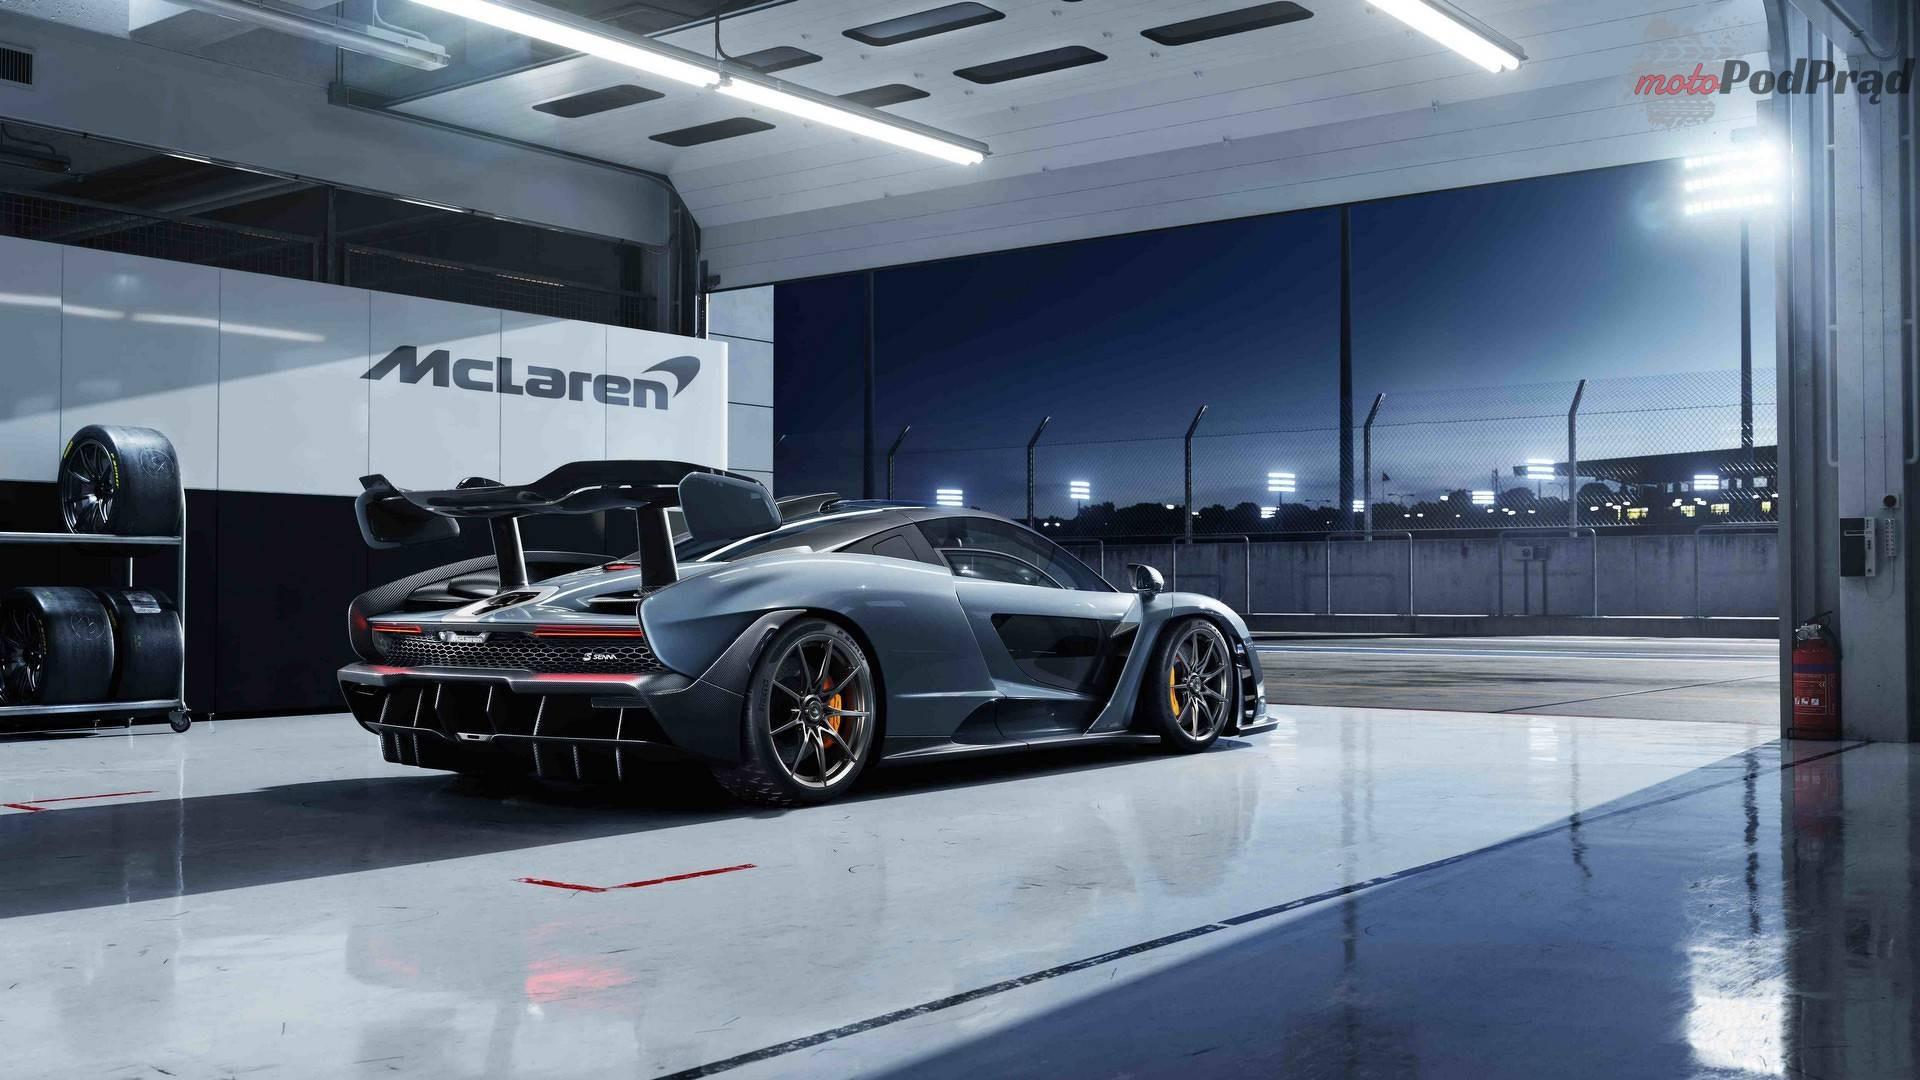 2018 mclaren senna 2 McLaren Senna   drogowy potwór